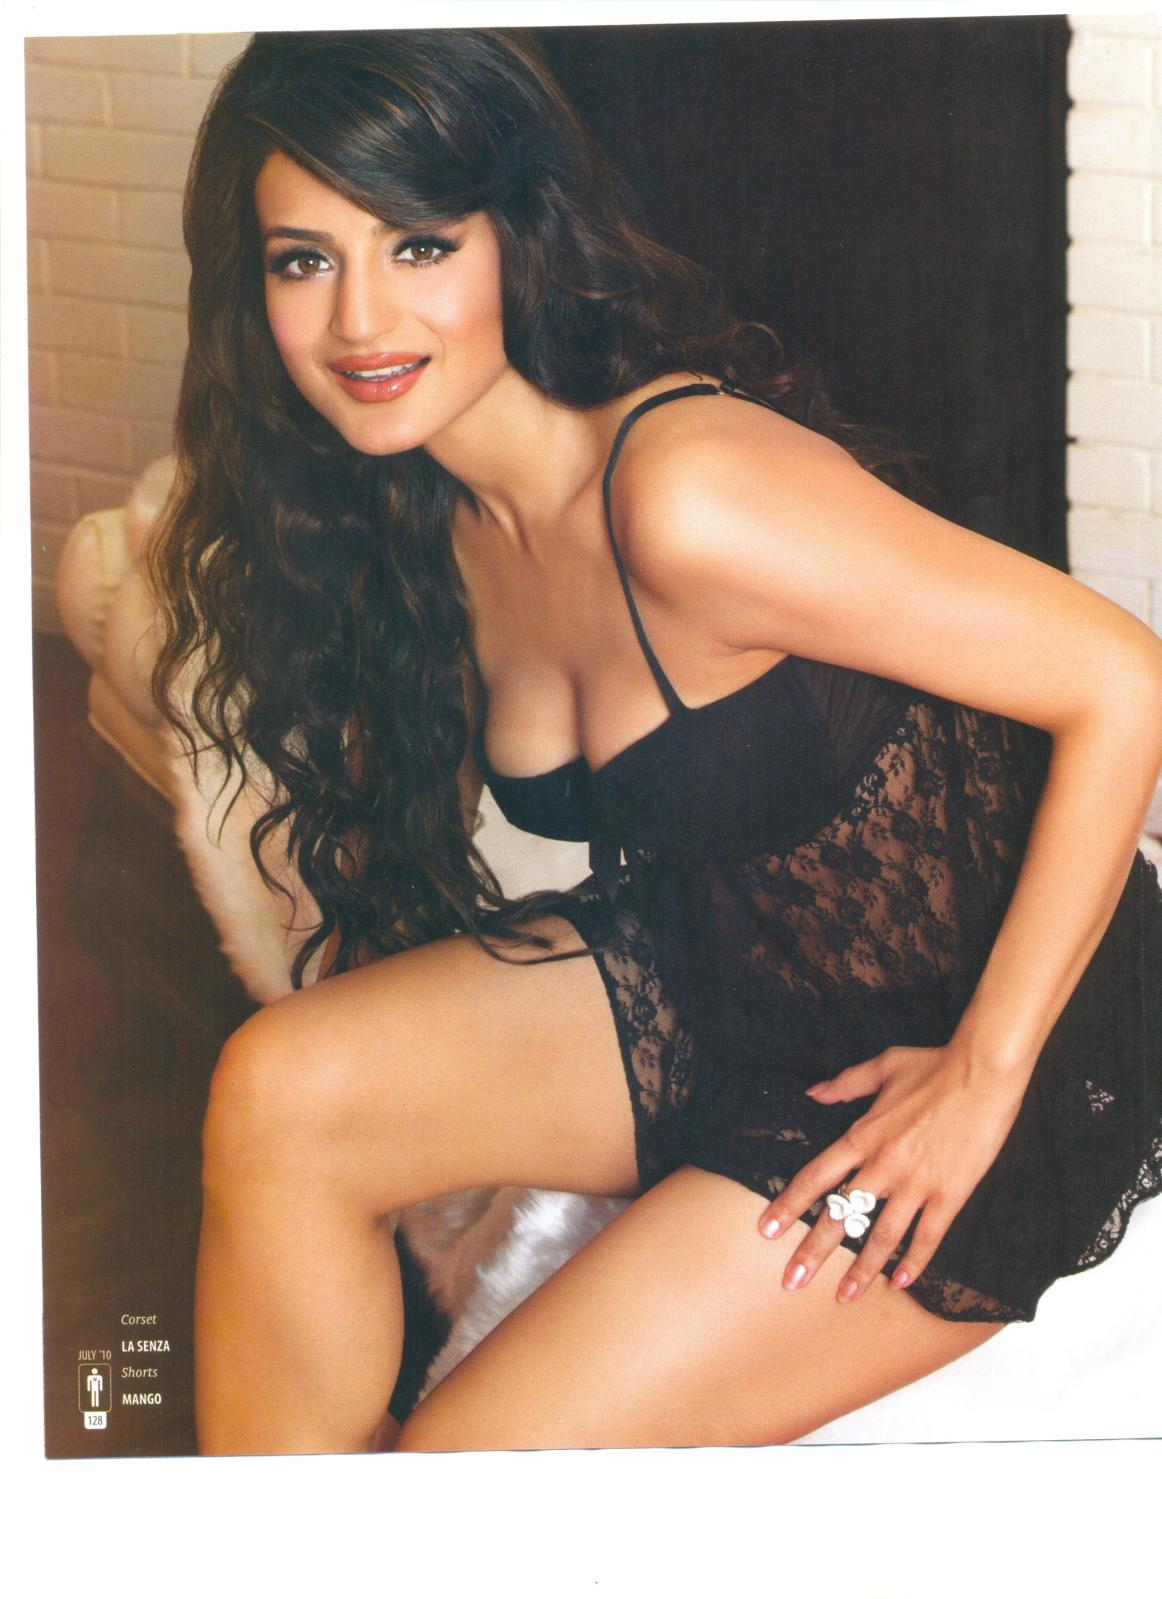 Fertyles: Amisha Patel Hot Photoshoot Pictures from The MAN Magazine ...